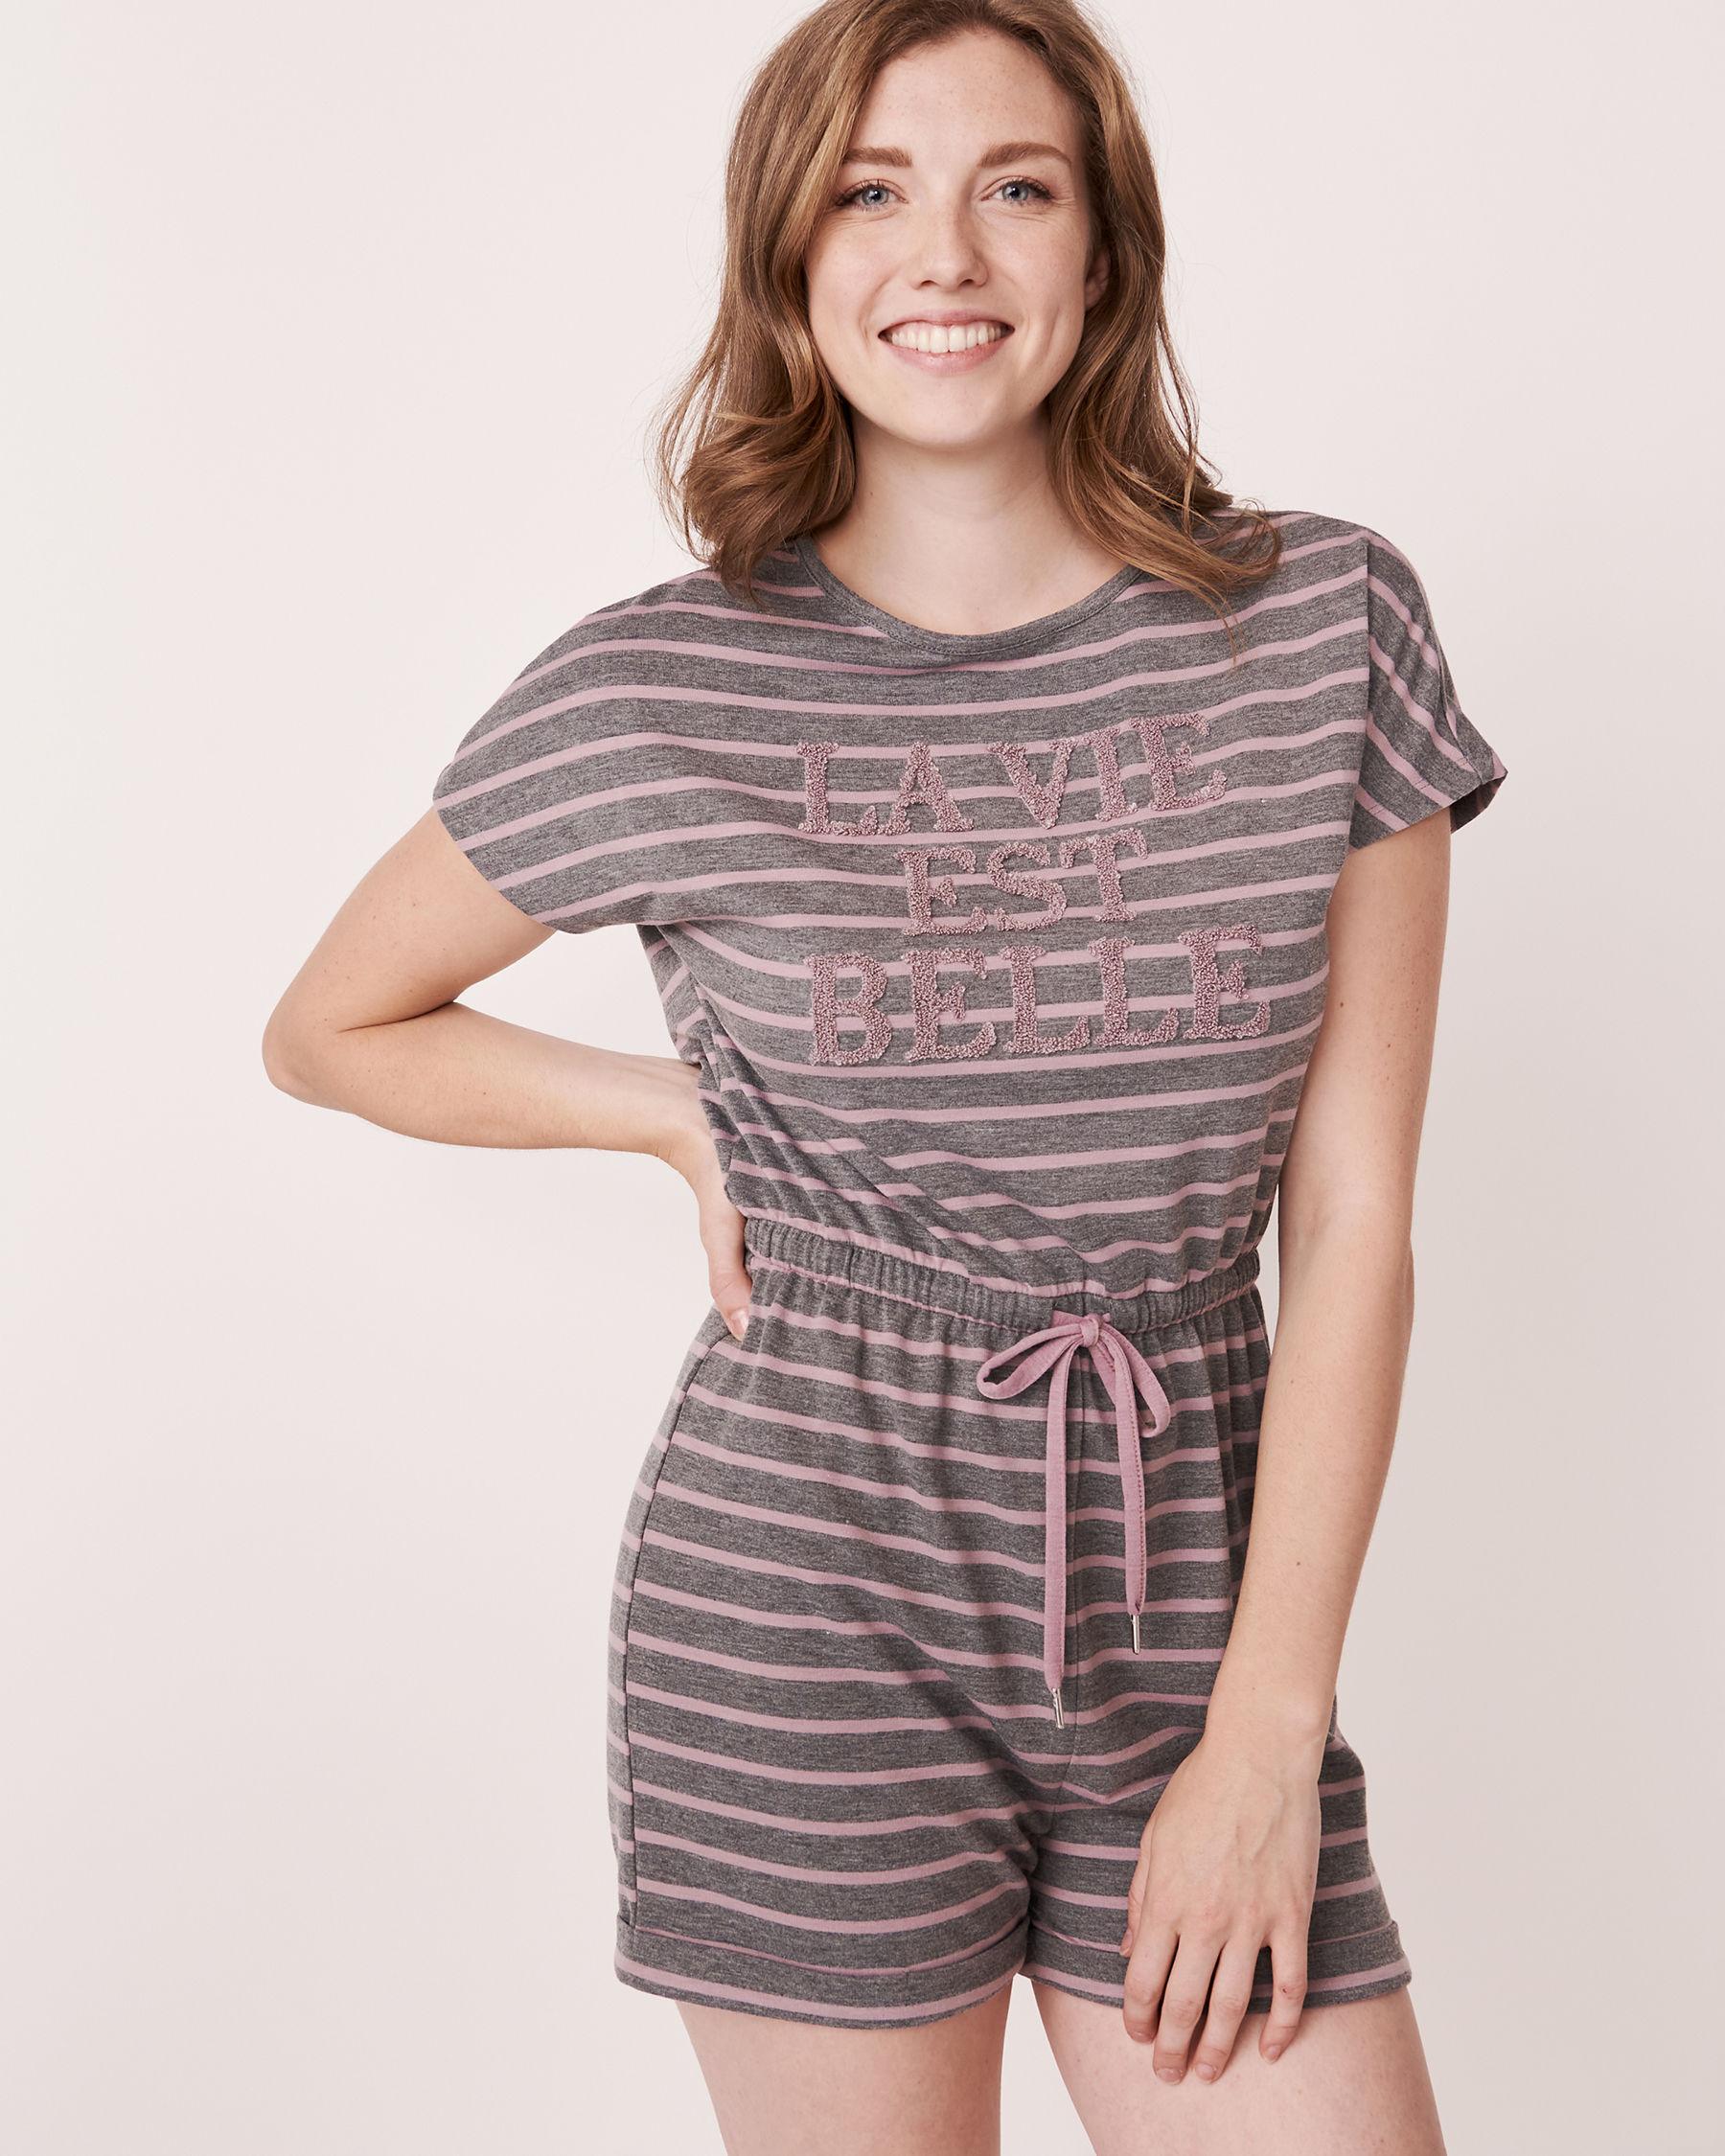 LA VIE EN ROSE Striped Romper Grey and pink mix 768-374-1-11 - View2